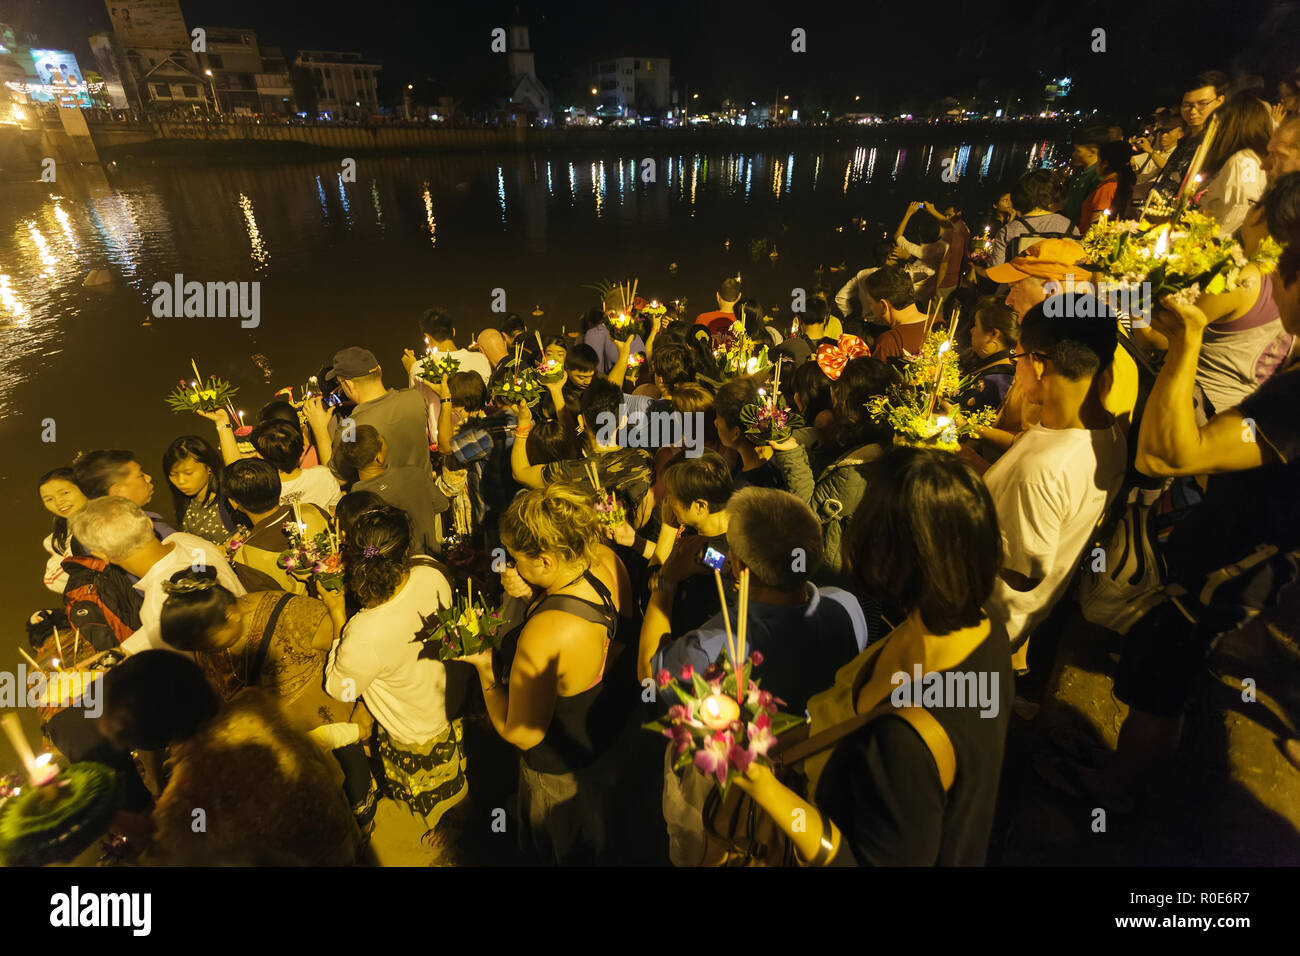 CHIANGMAI THAILAND NOVEMBER 28: Thai Menschen loslassen floating Angebote in Loy Krathong und Yi Peng Festival am 28 November, 2012 Chiangmai, Thail Stockfoto